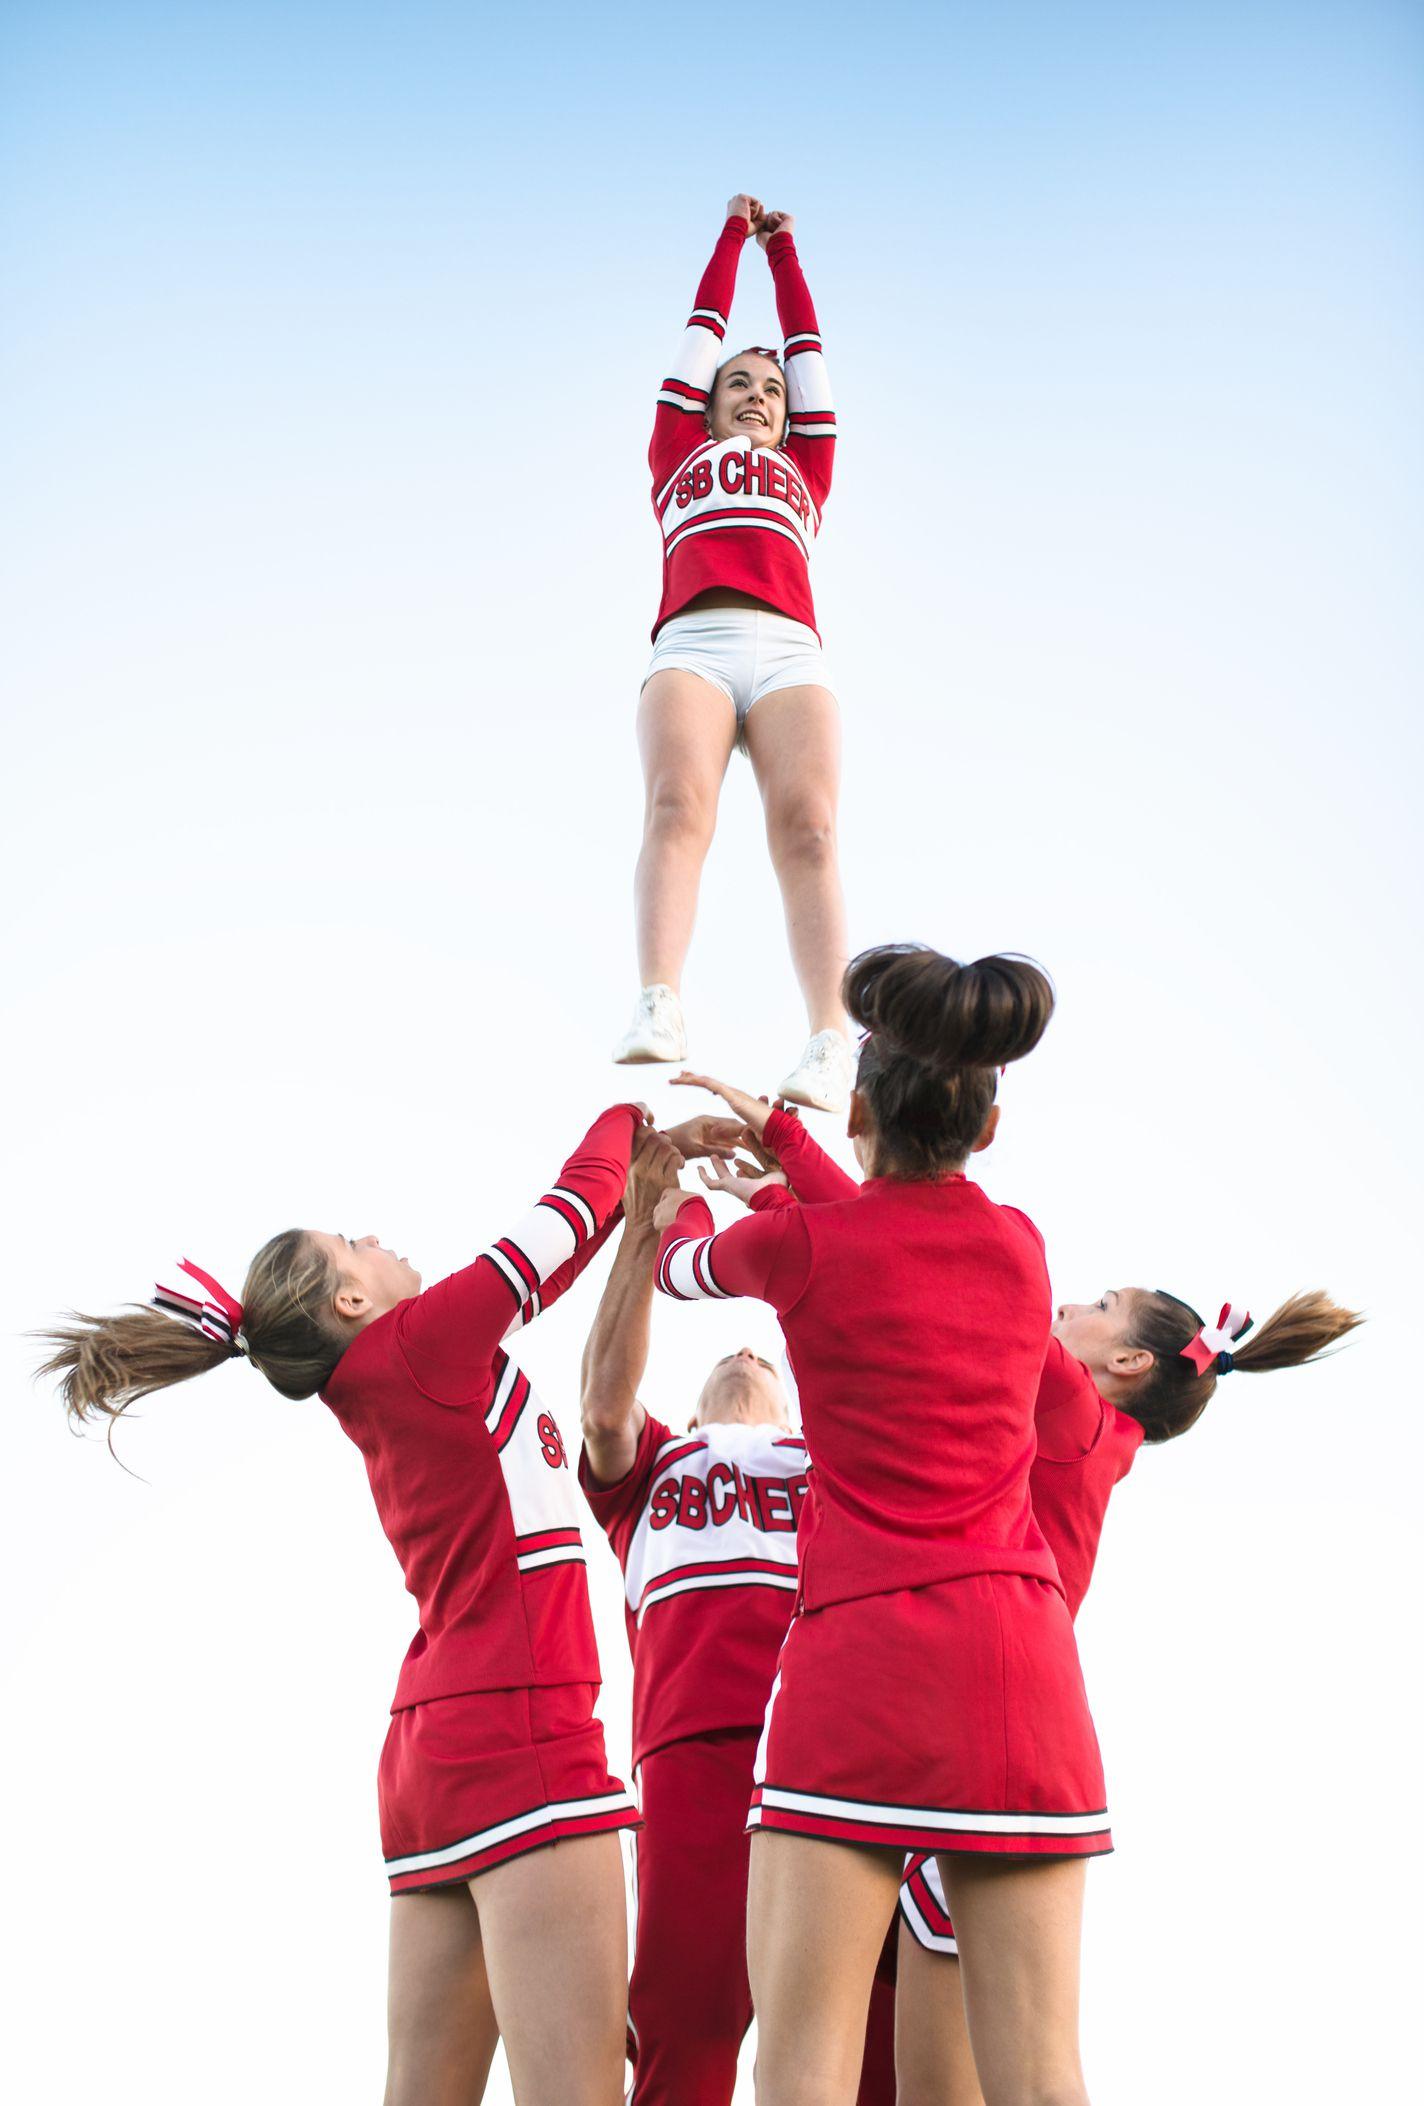 Collection Of Cheerleaders Favorite Cheers